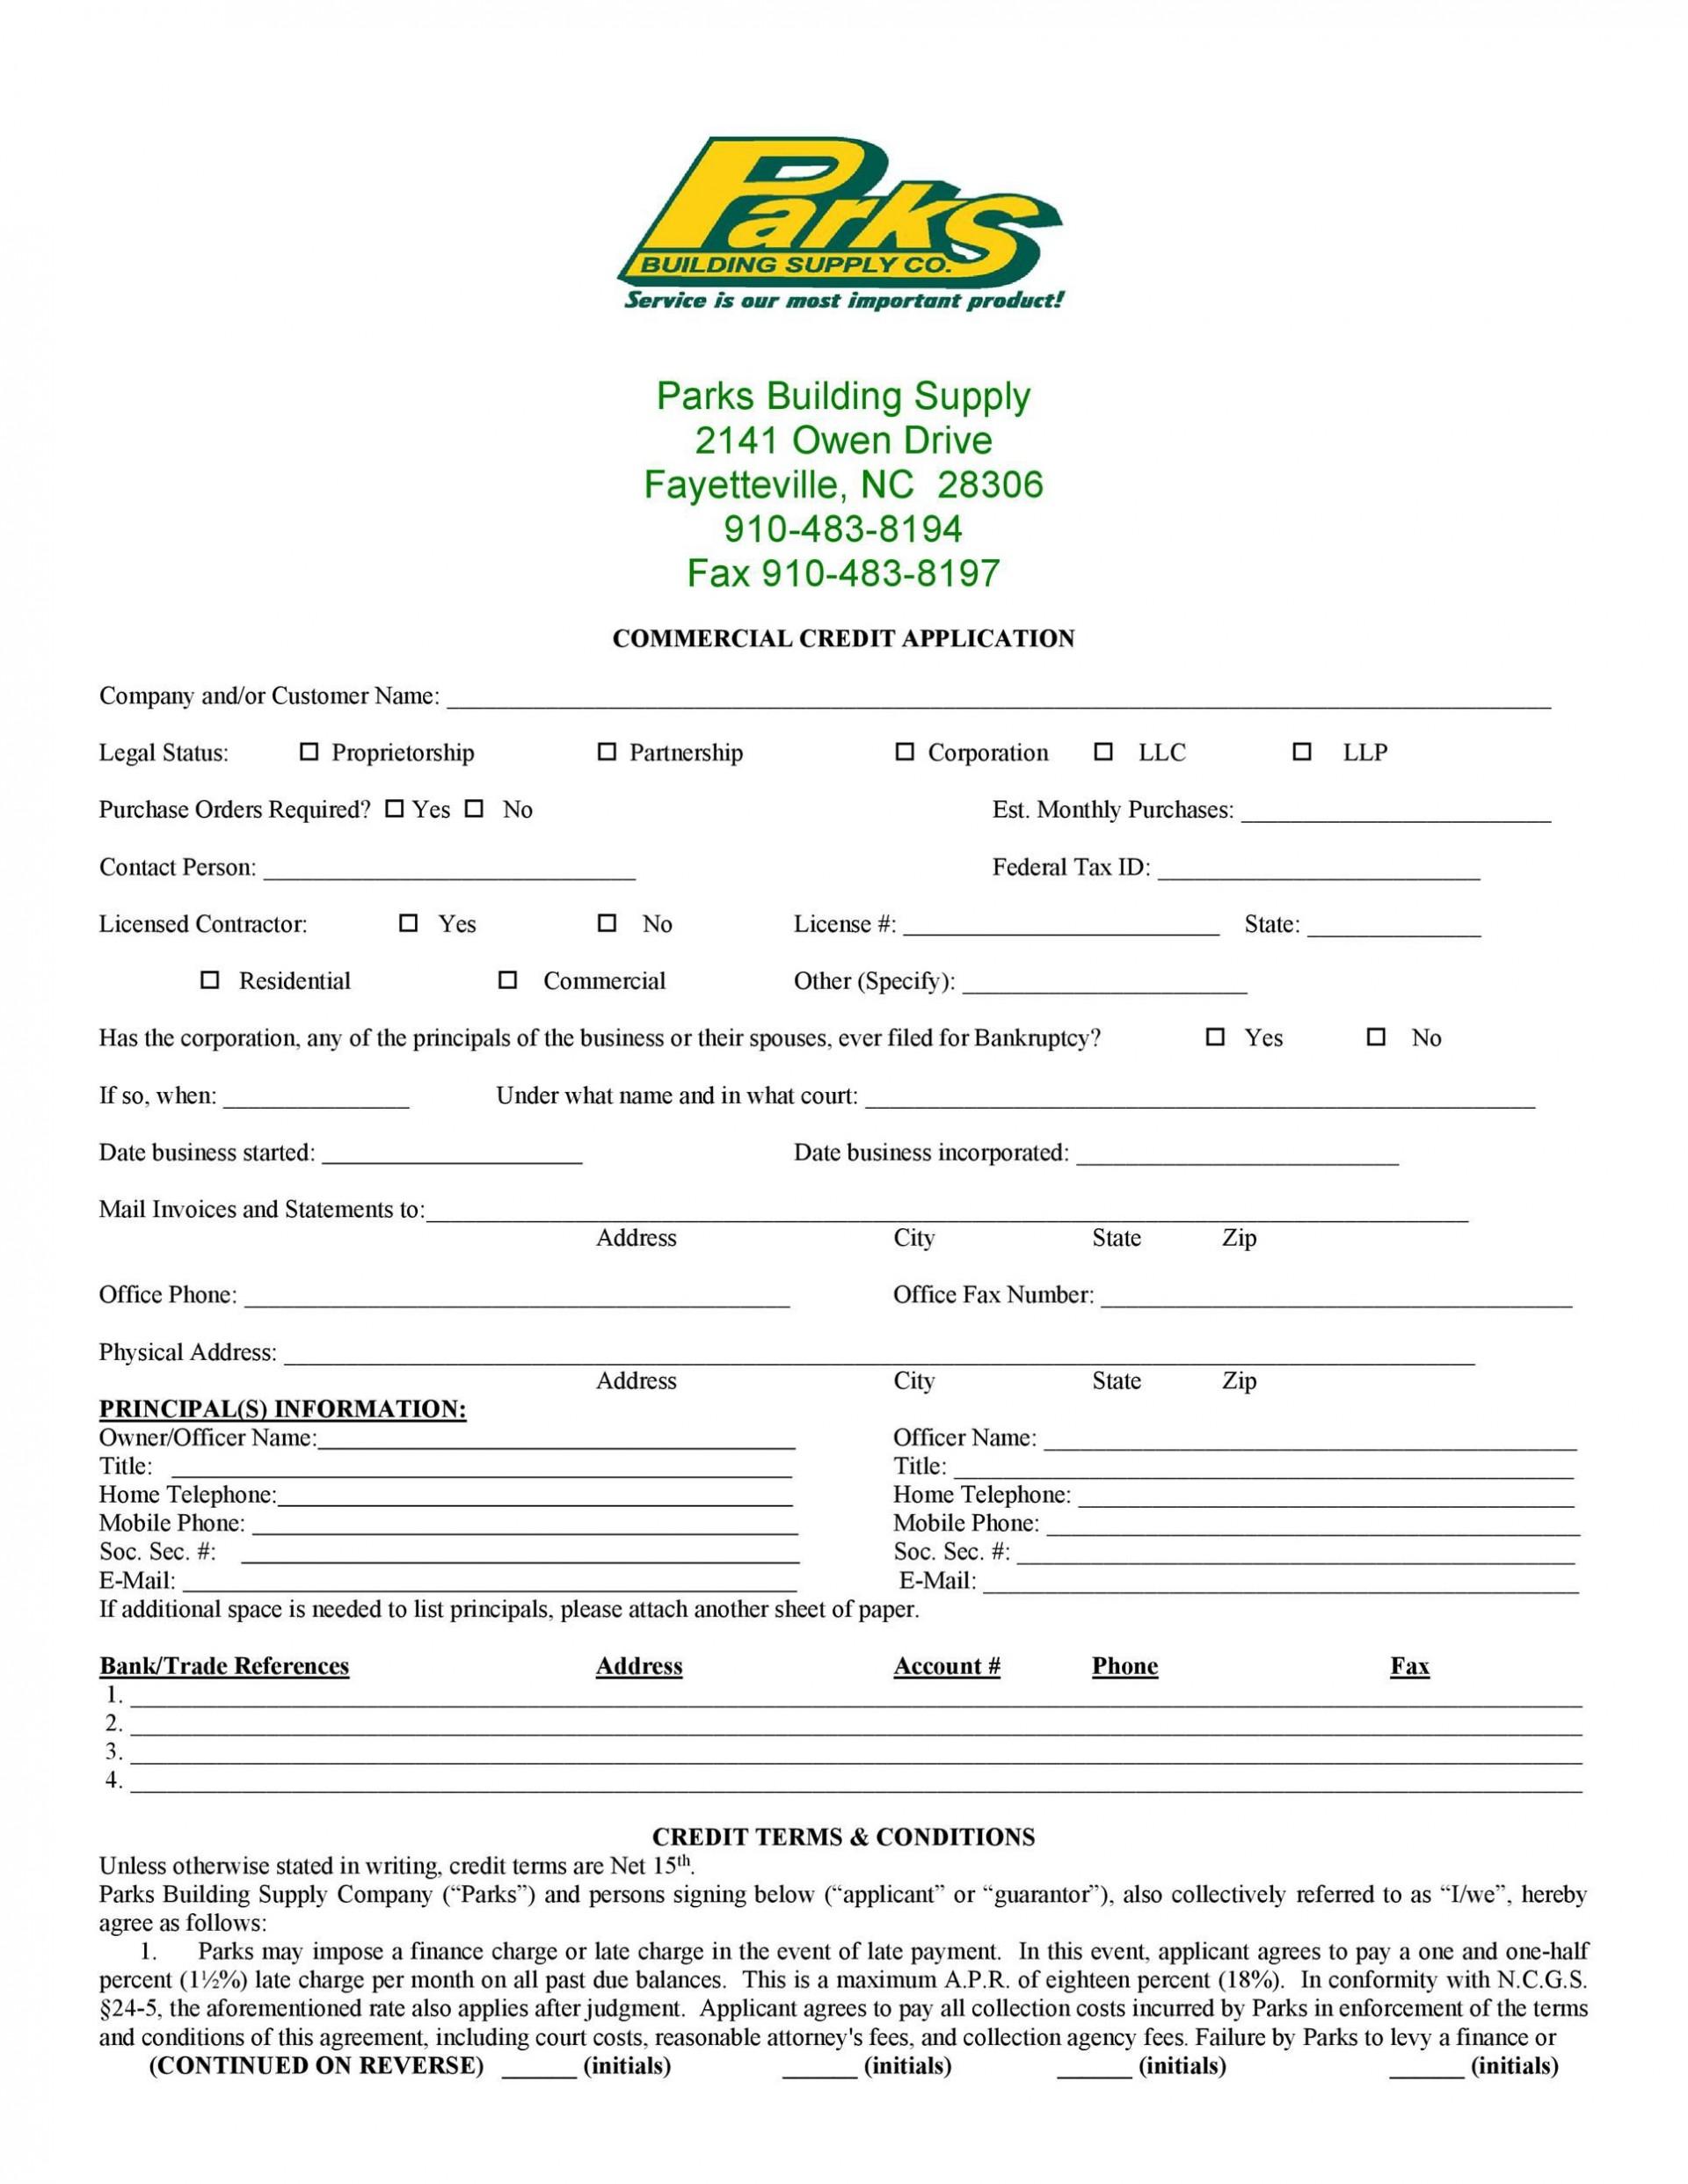 008 Unusual Busines Credit Application Form Free Idea  Template1920